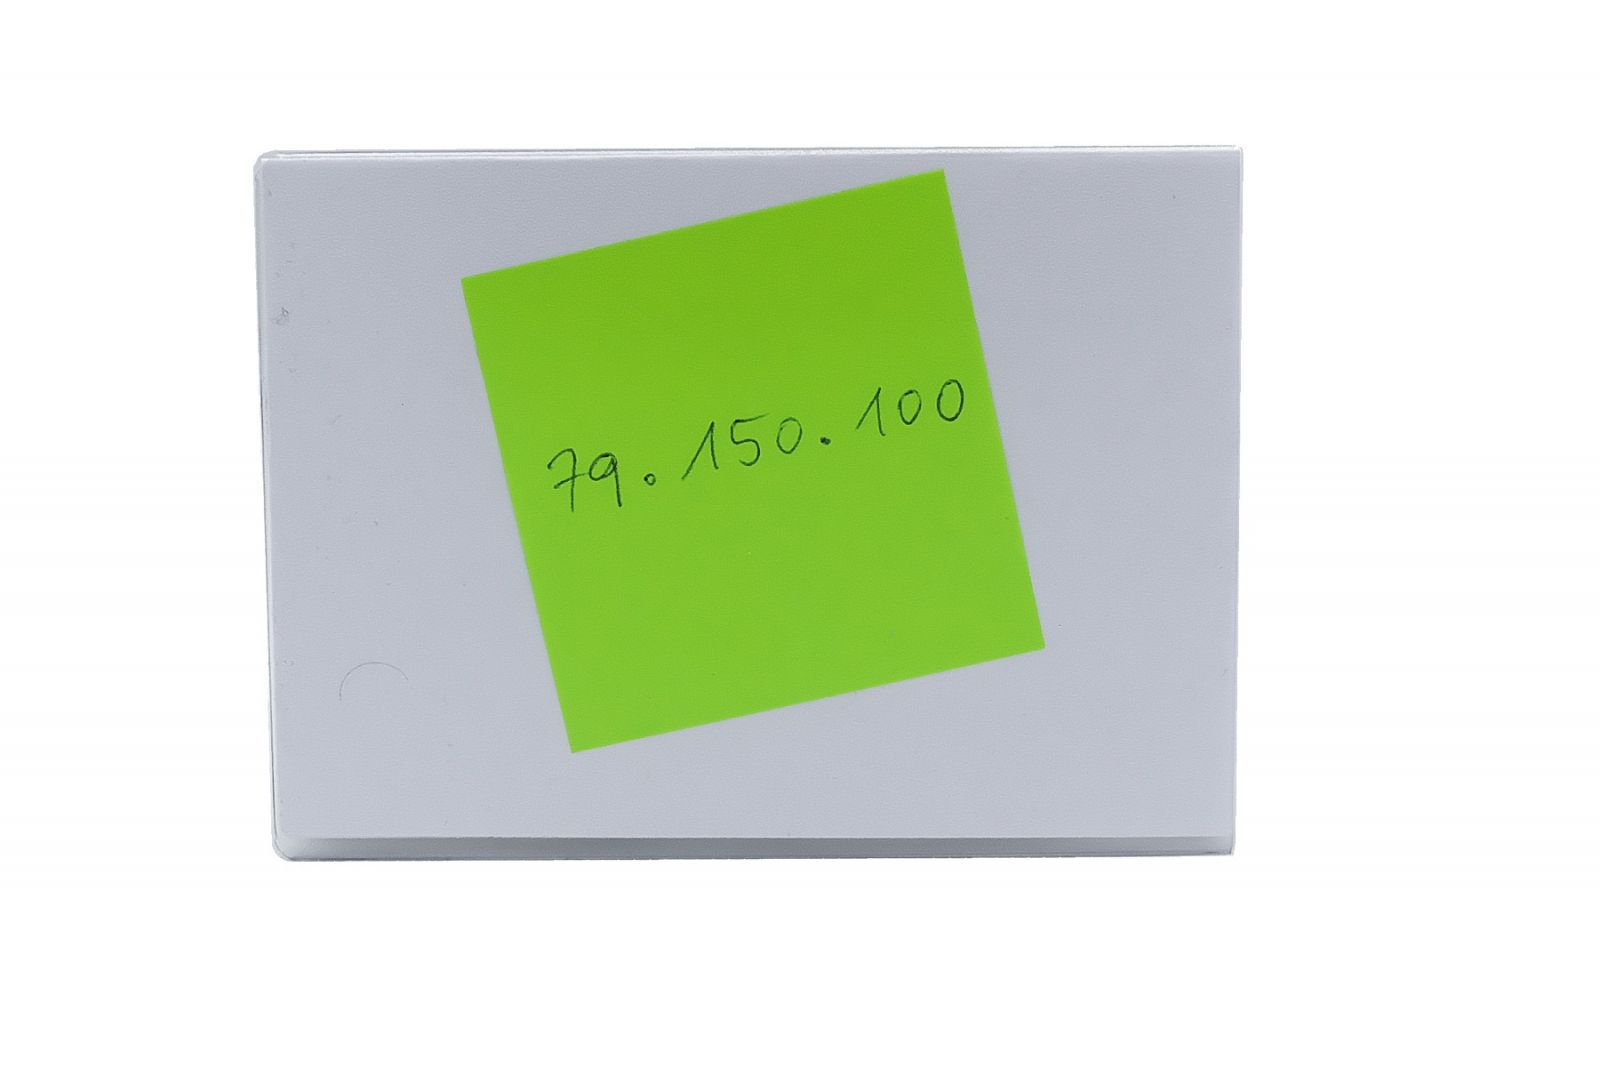 Infosichttasche 79.150.100